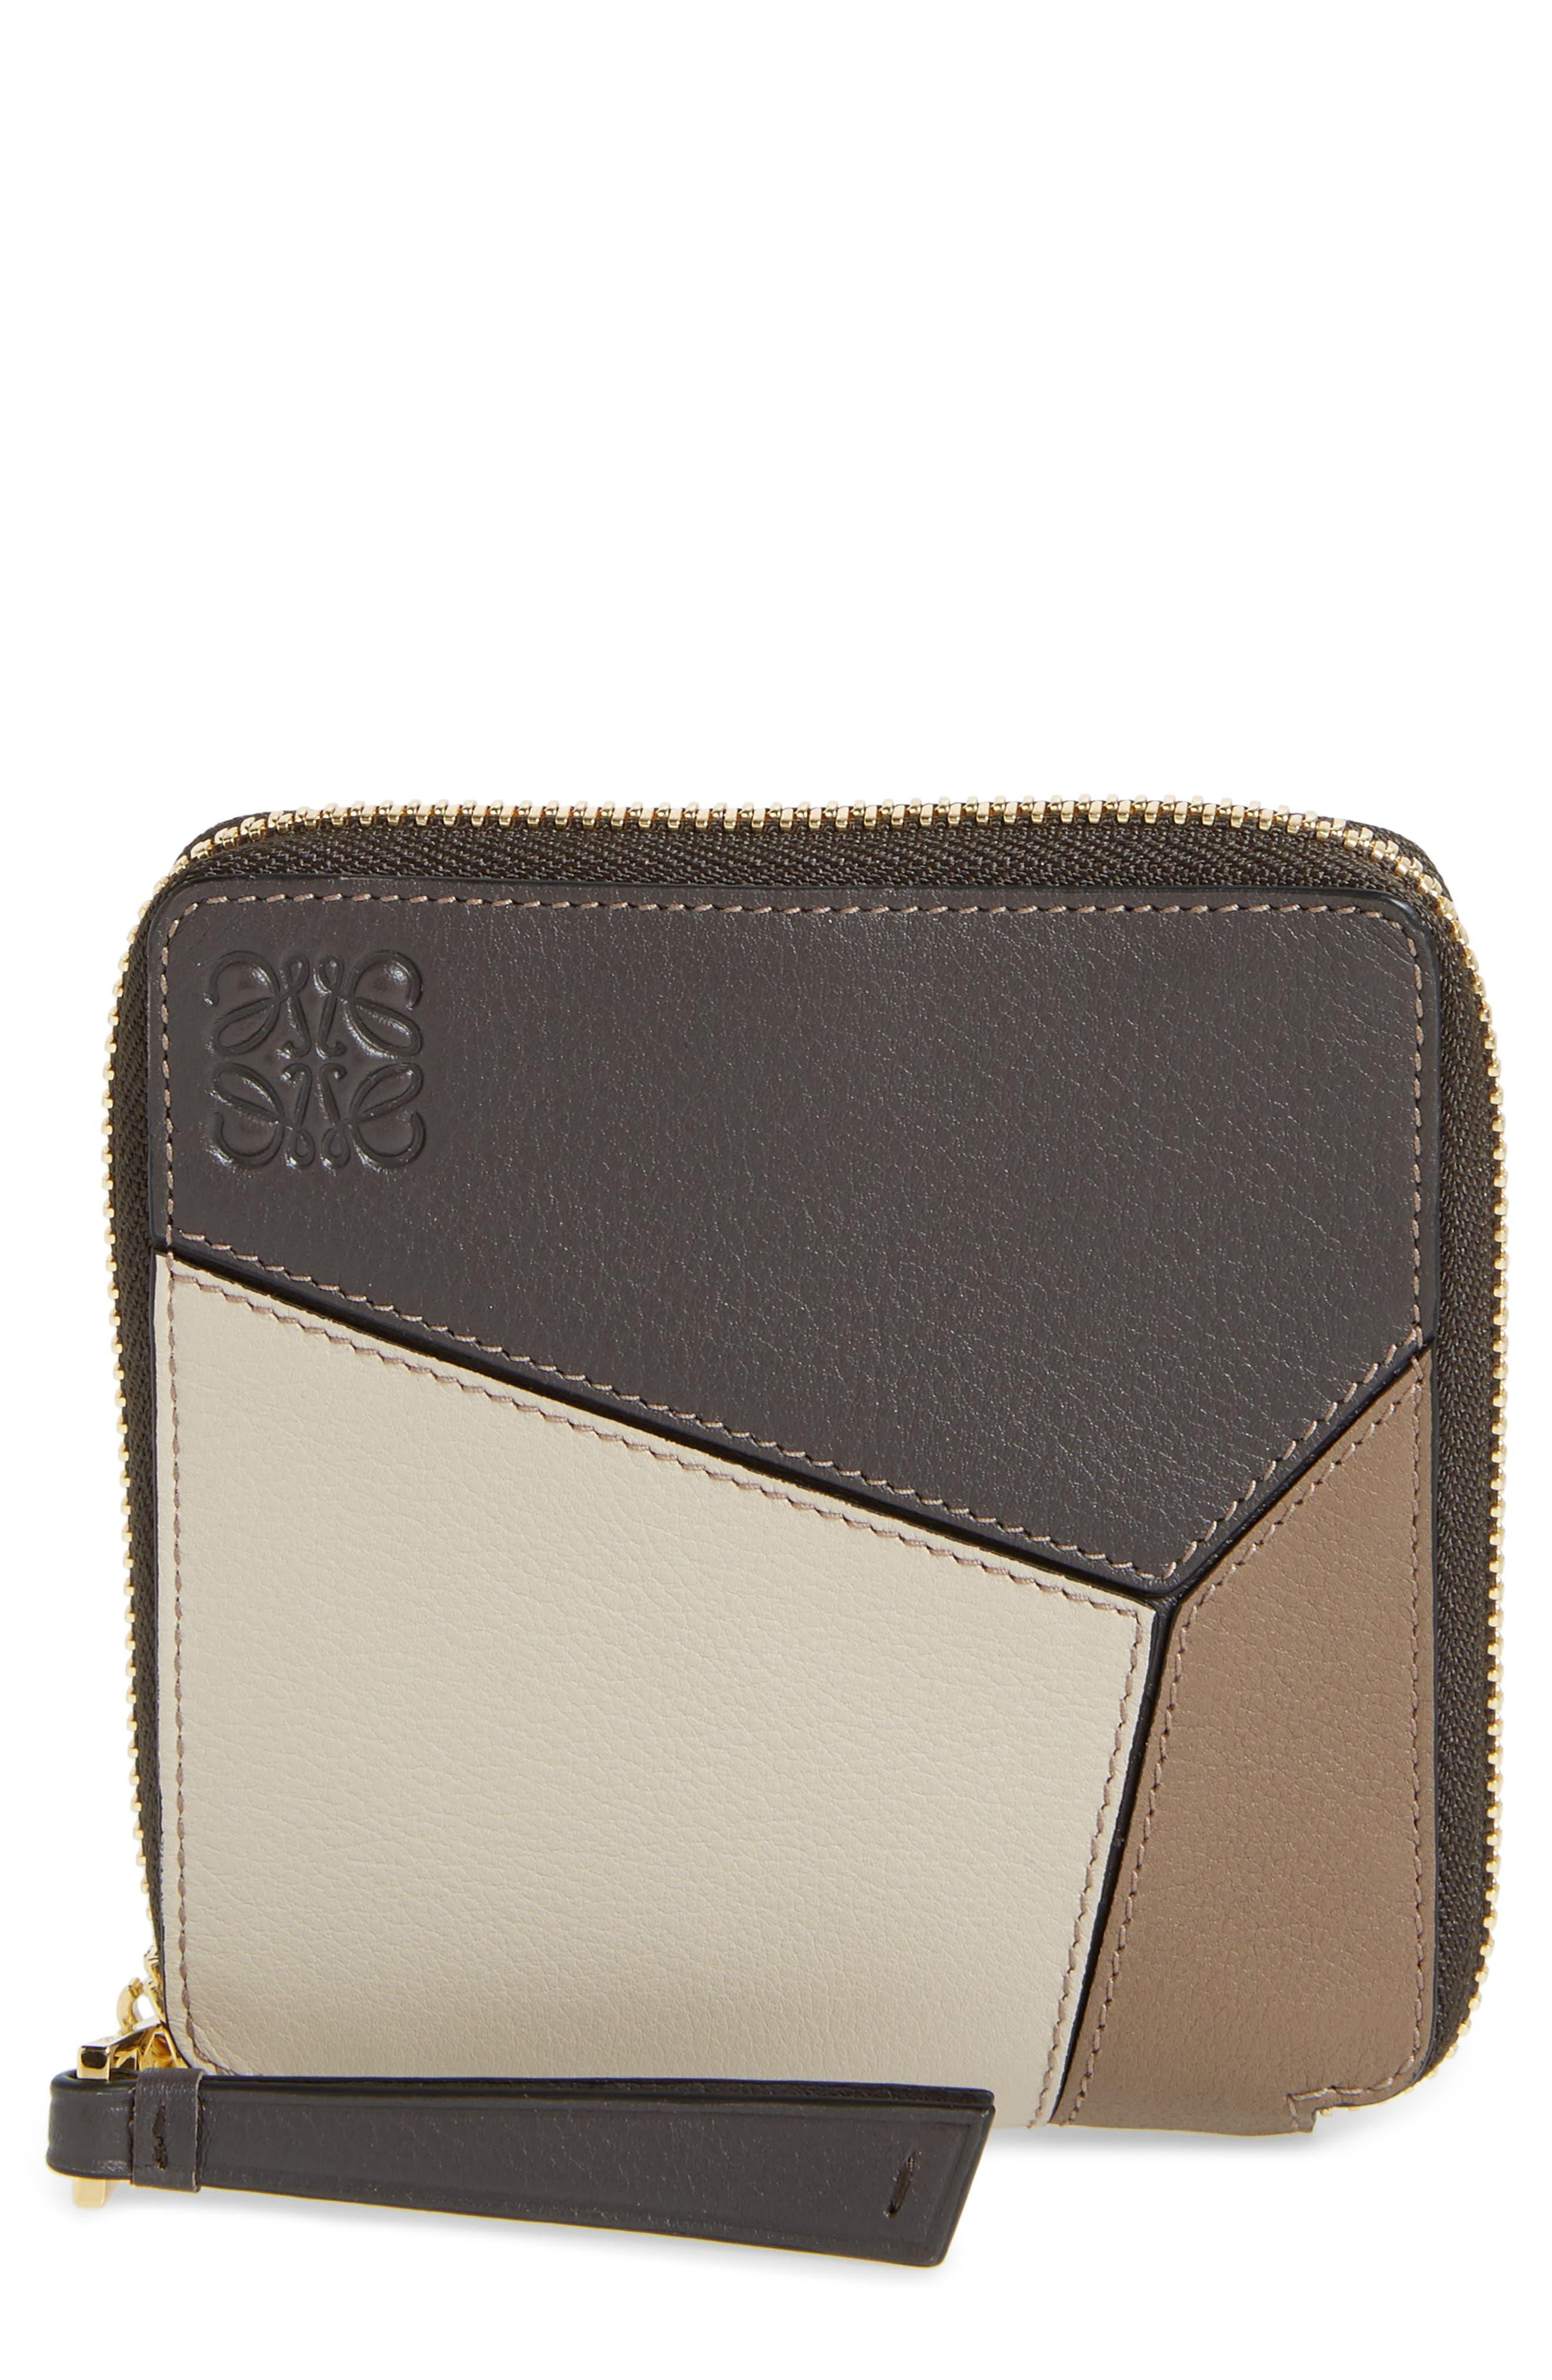 Denim Puzzle Colorblock Leather French Wallet,                             Main thumbnail 1, color,                             200